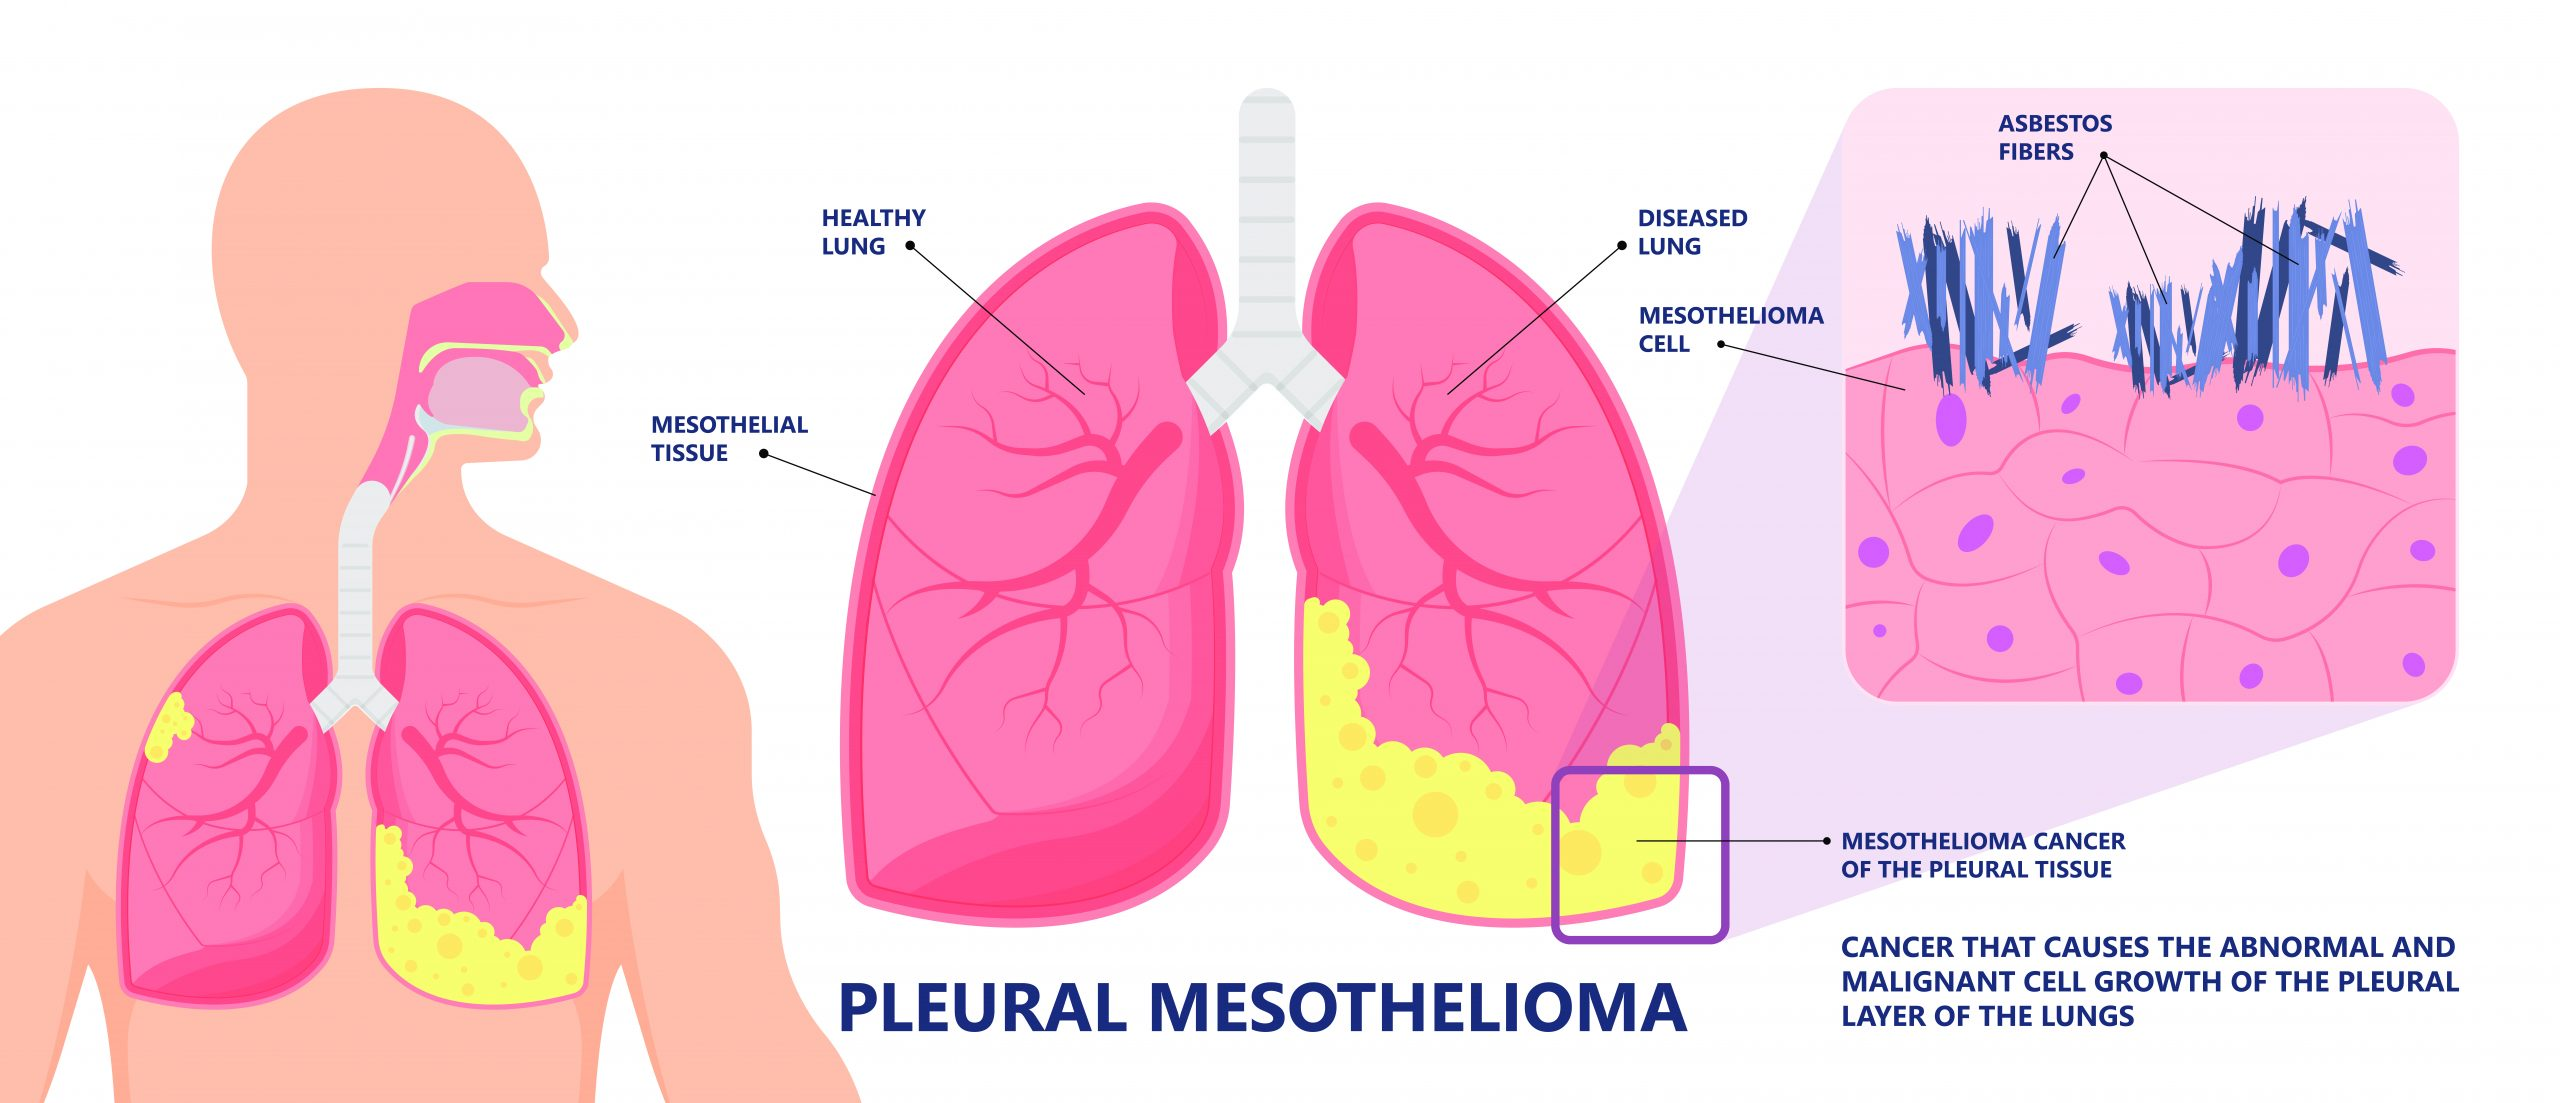 Gemcitabine + ramucirumab effective for pleural mesothelioma